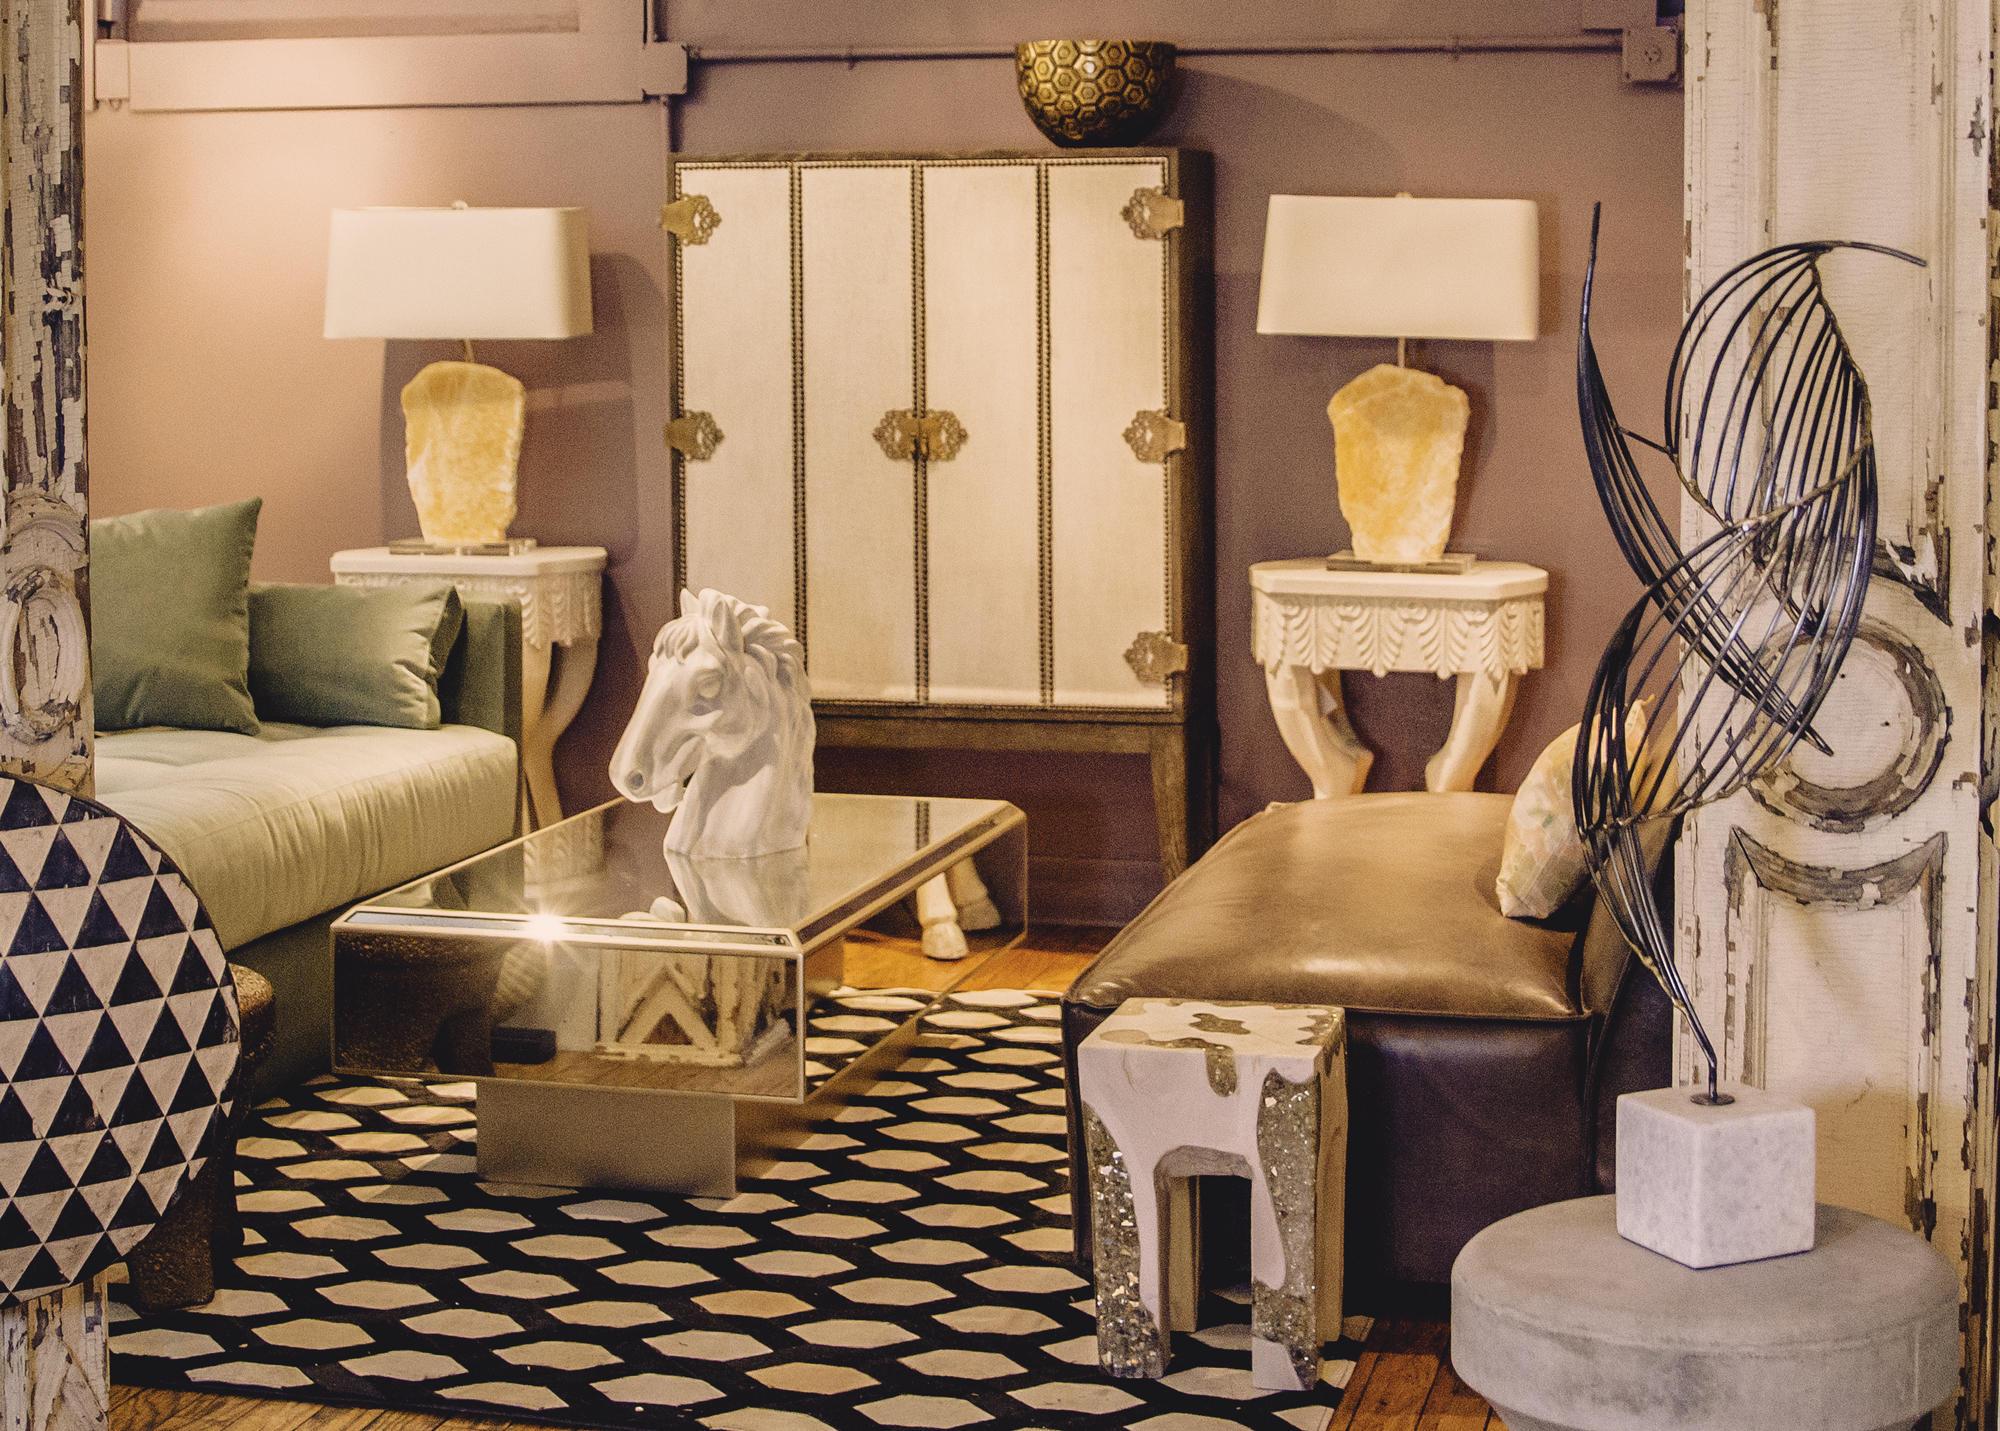 Global home interior design princeton new jersey nj for Interior design businesses near me